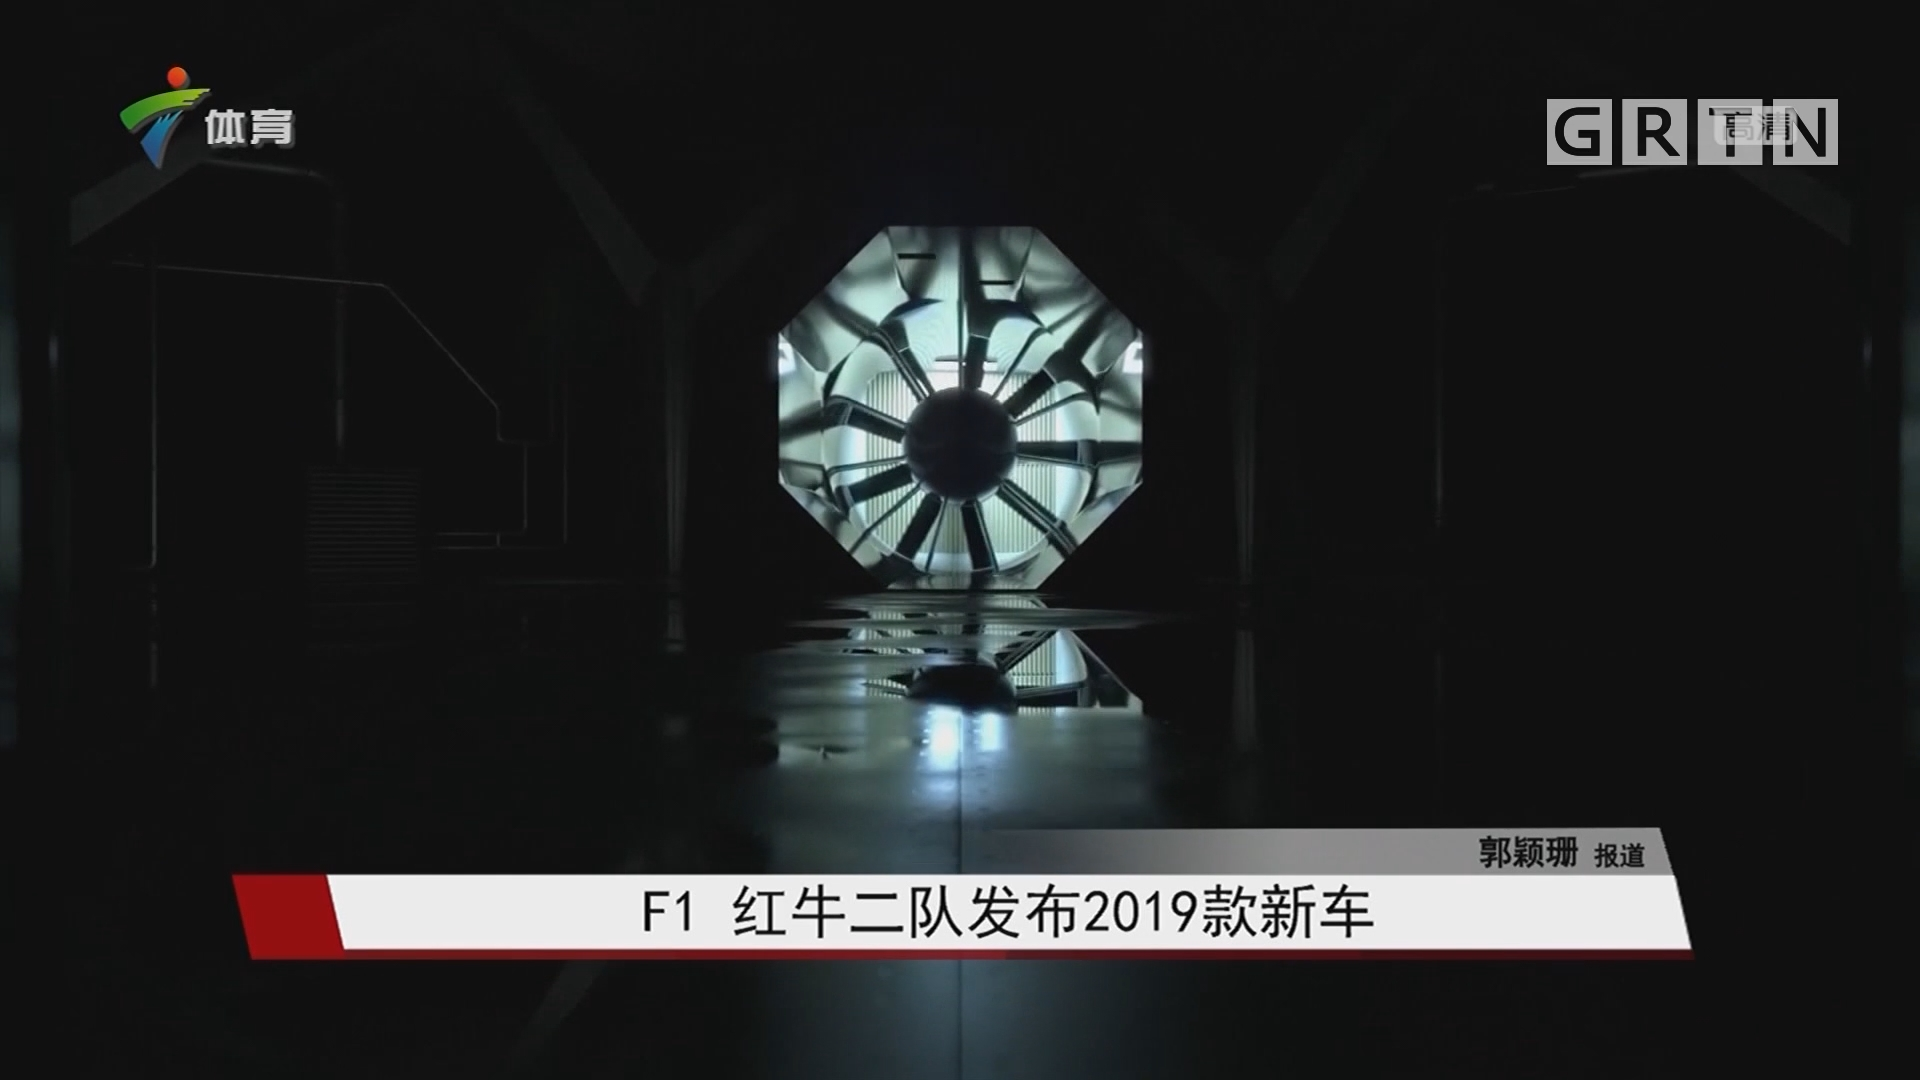 F1 红牛二队发布2019款新车